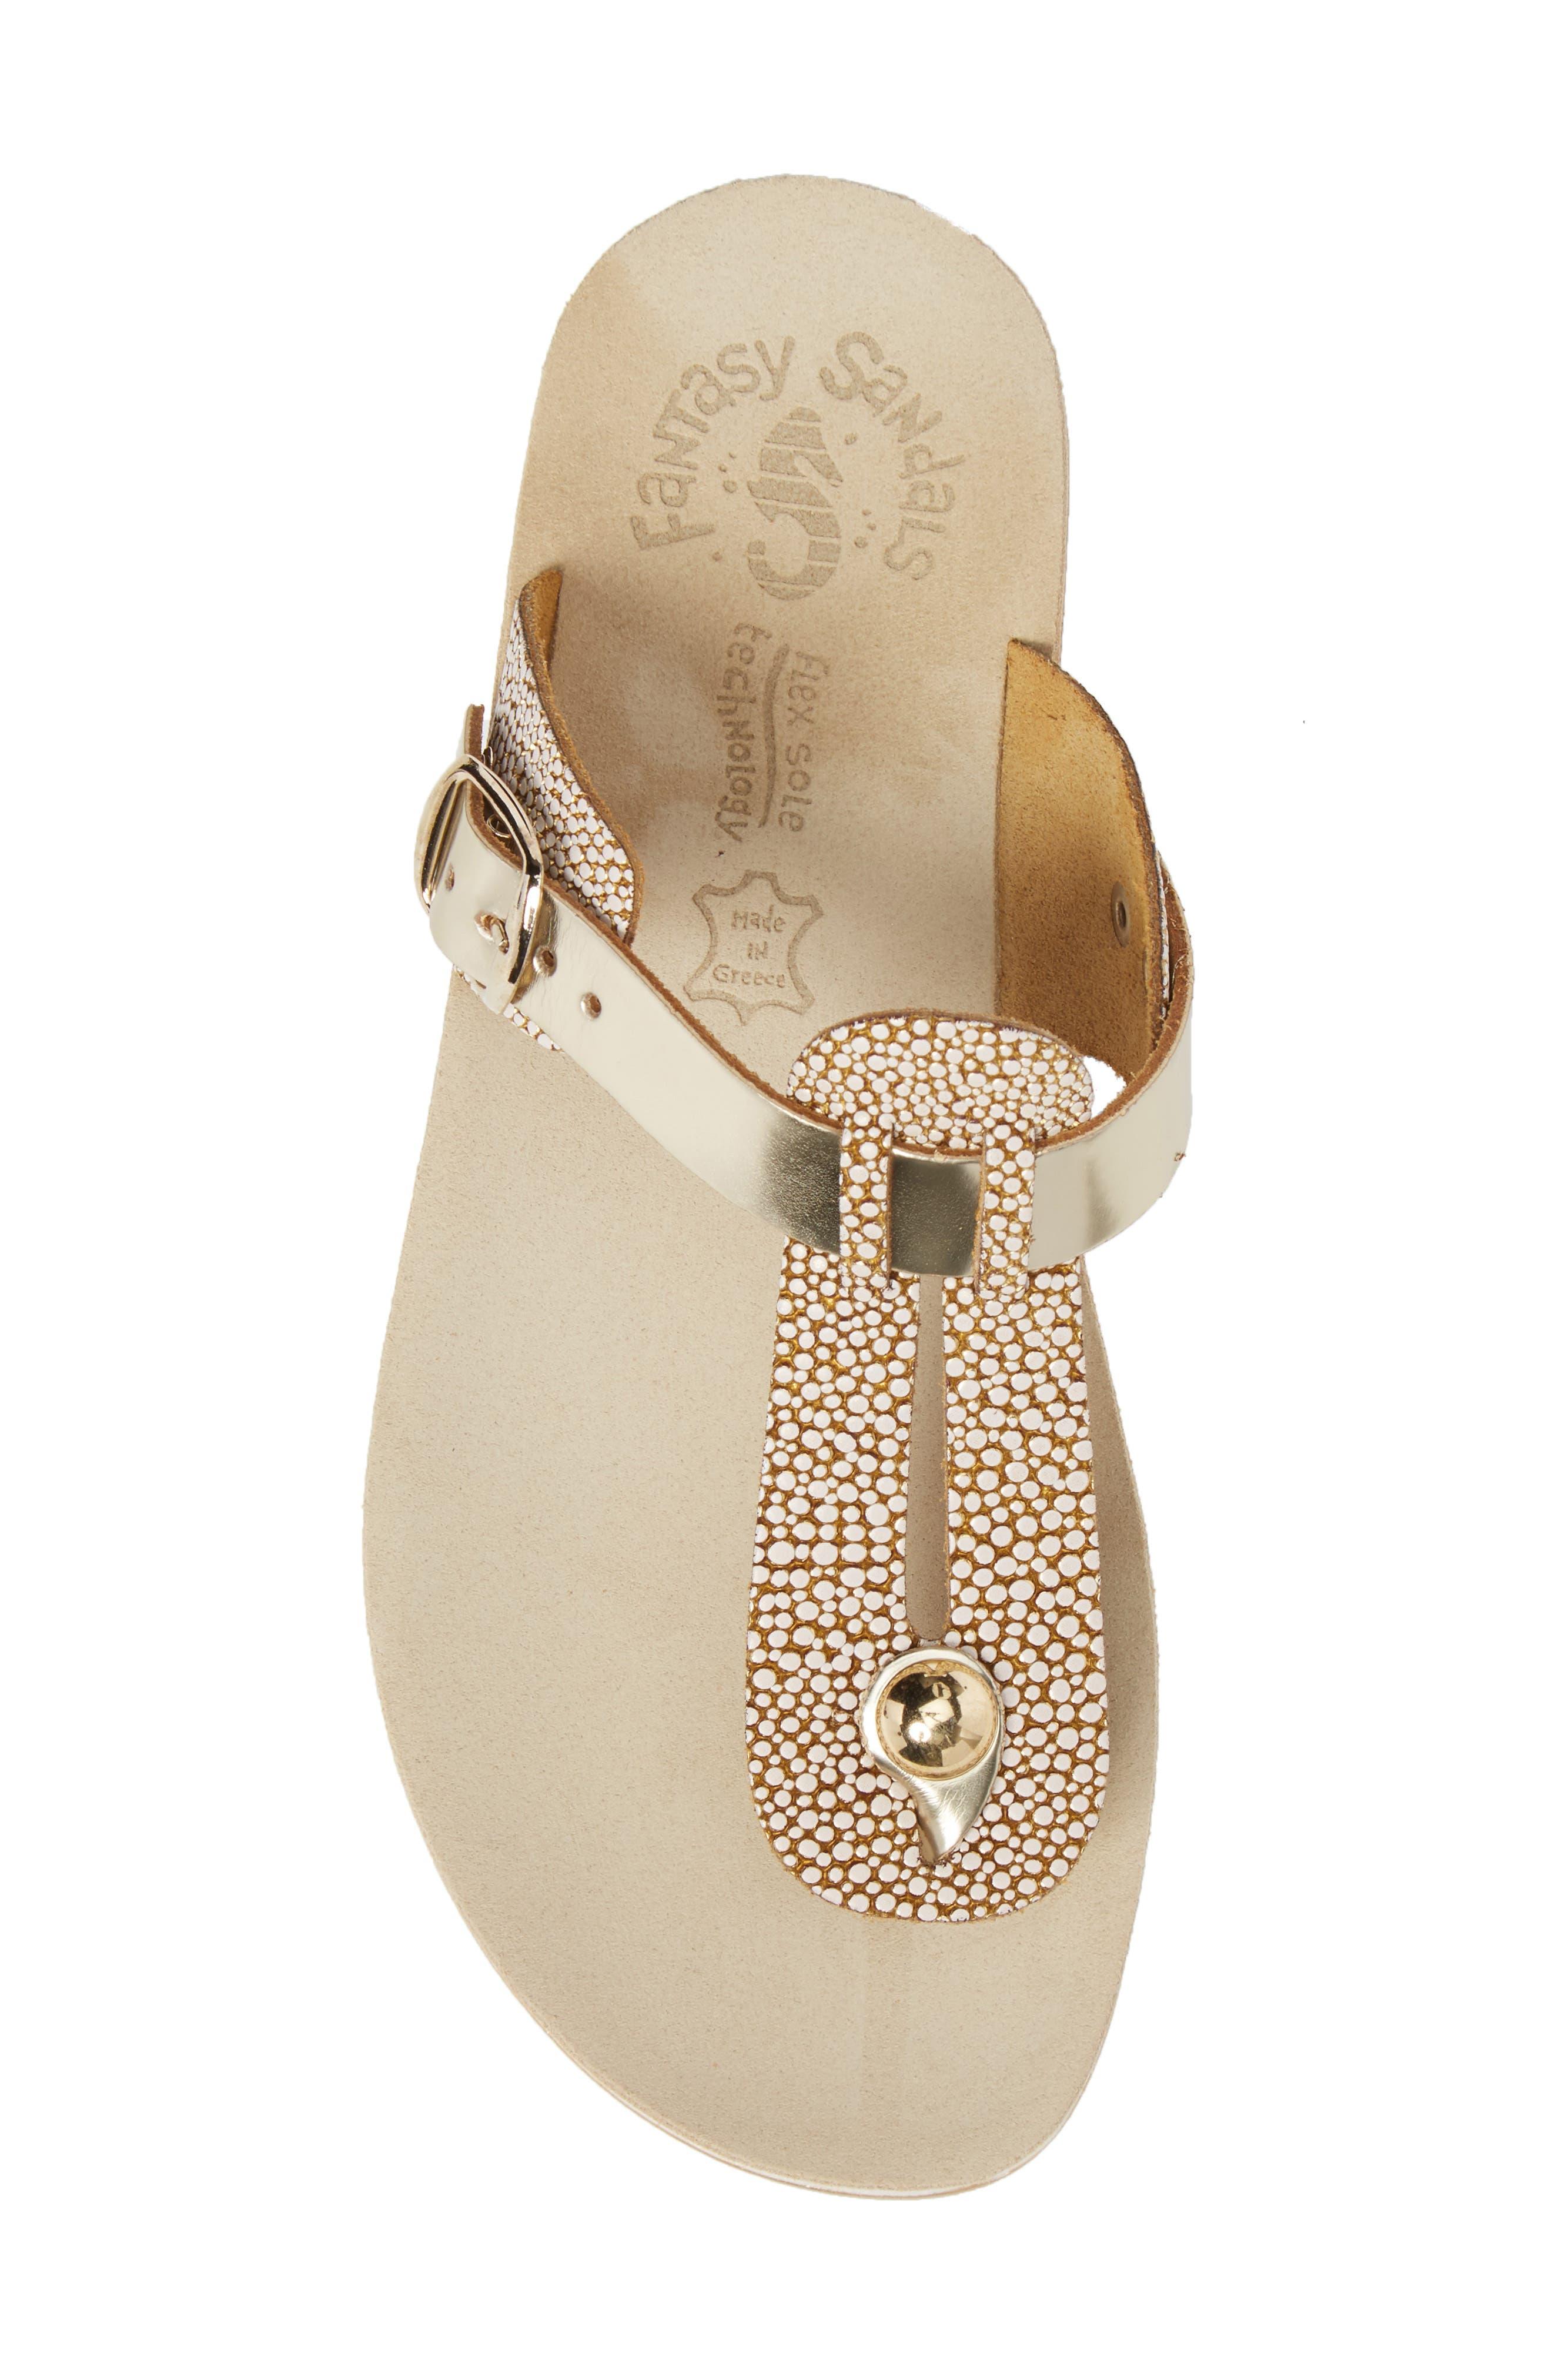 Mirabella Fantasy Sandal,                             Alternate thumbnail 5, color,                             Gold Caviar Leather